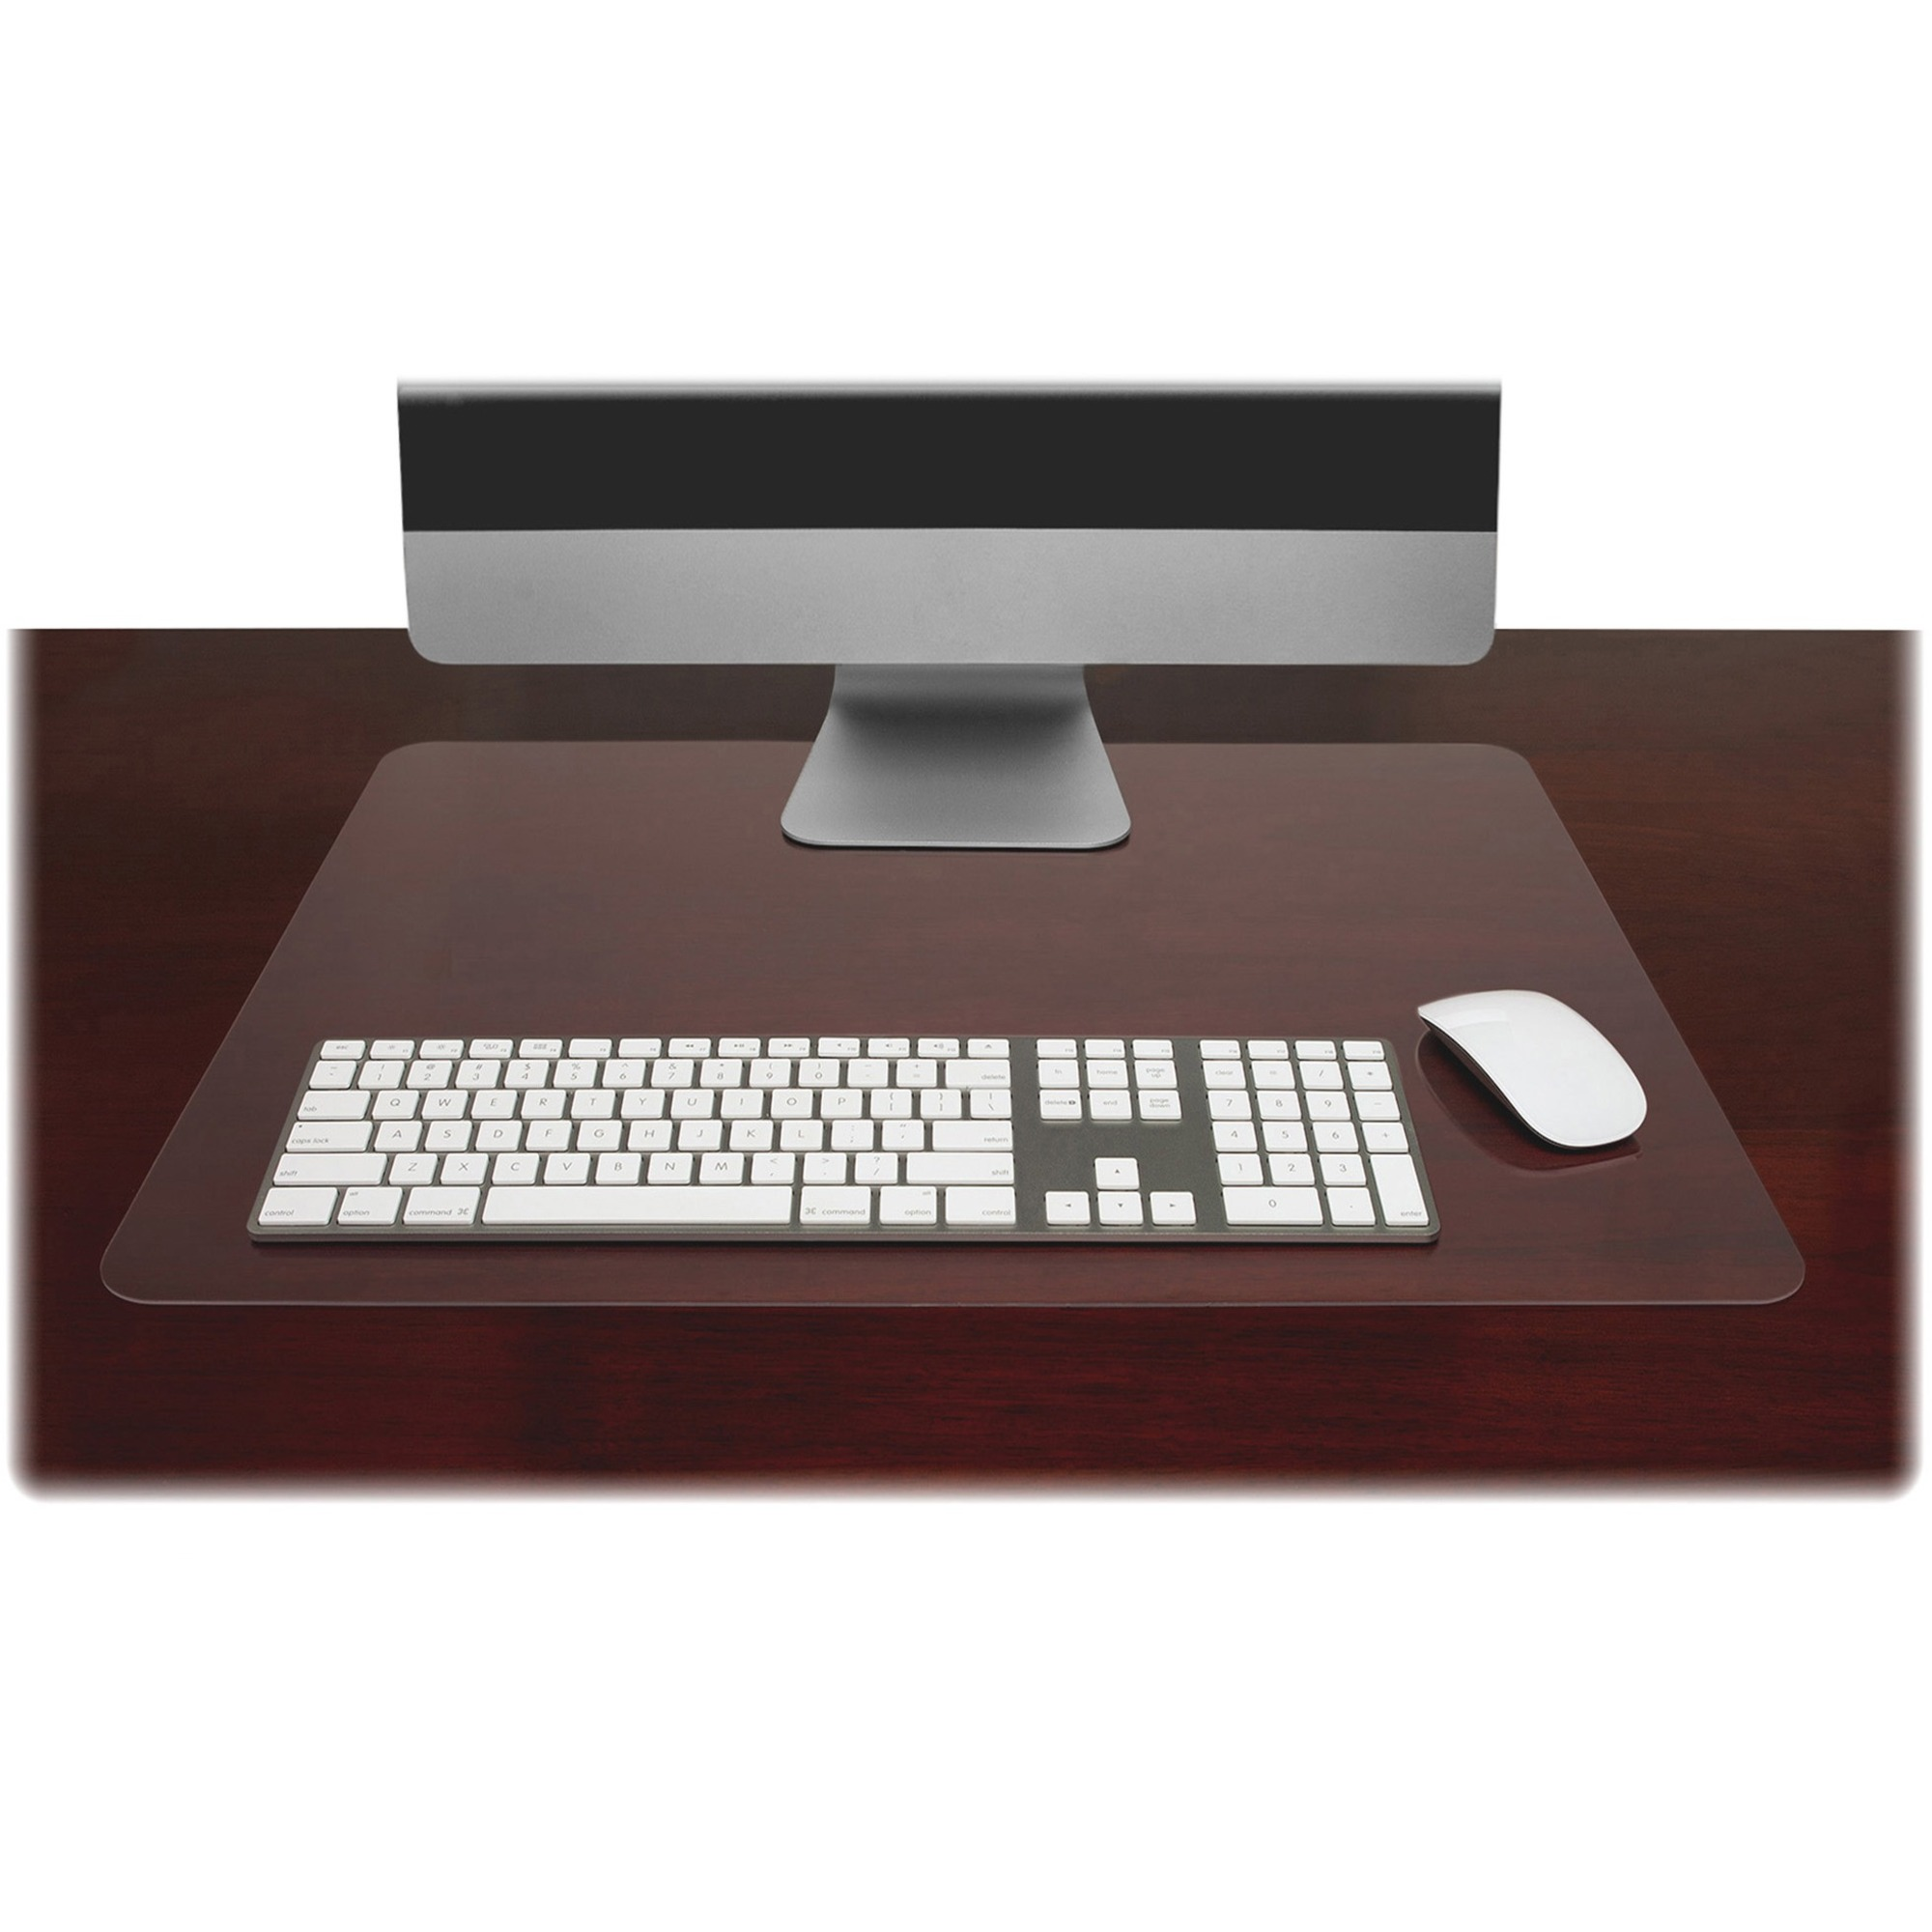 Home Office Supplies Desk Organizers Desktop